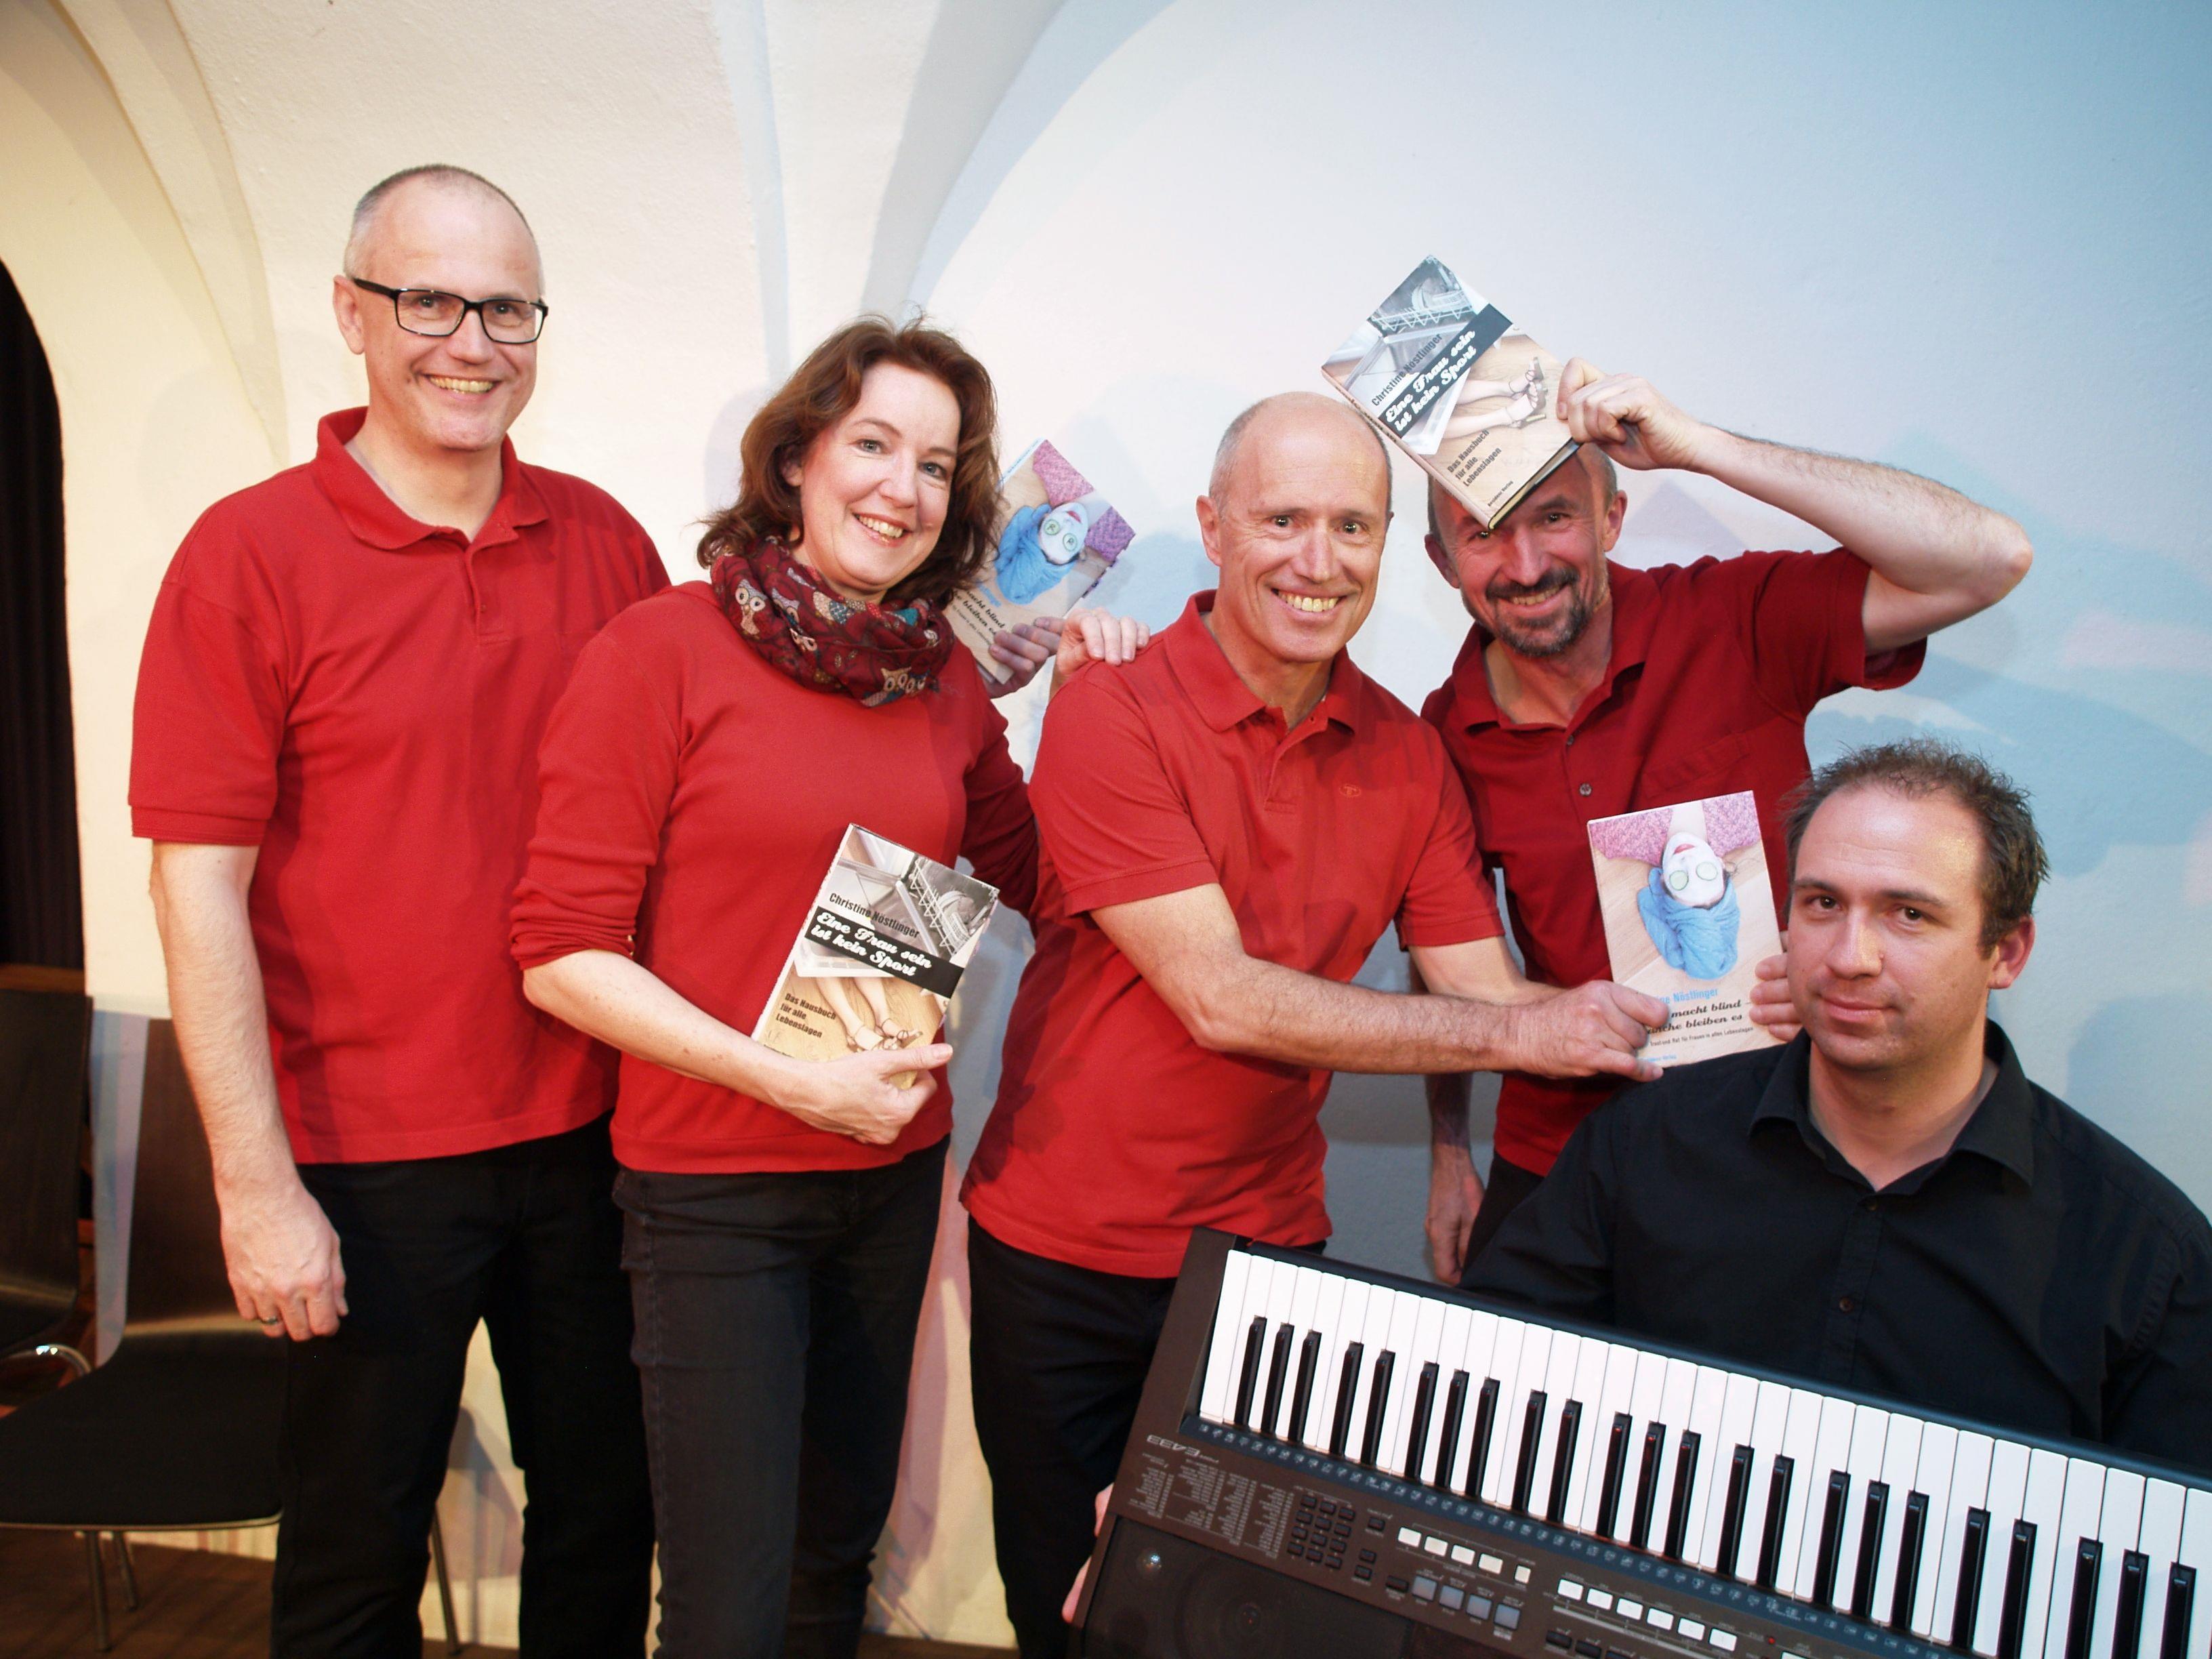 Harald Kuntschik, Renee Lormans, Paul Ender, Paul Sandholzer und Matthias Gmeiner